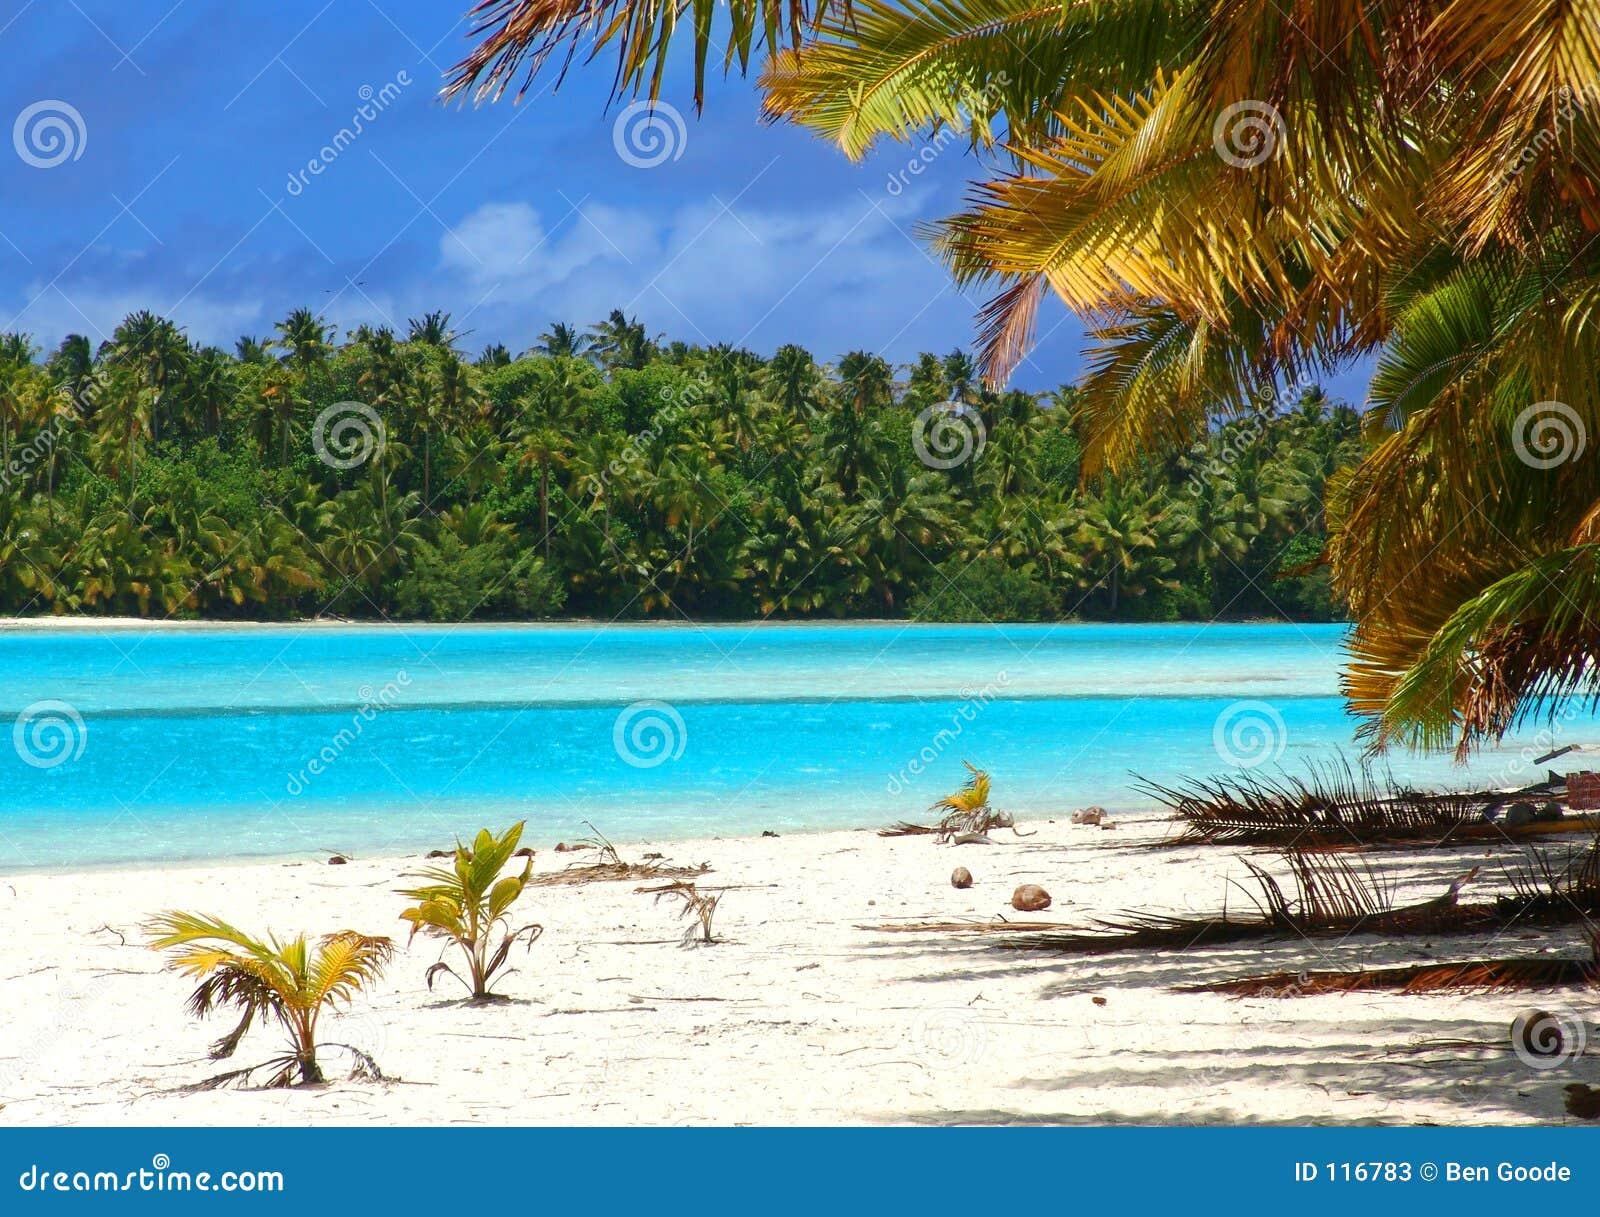 Tropical Beach Scene